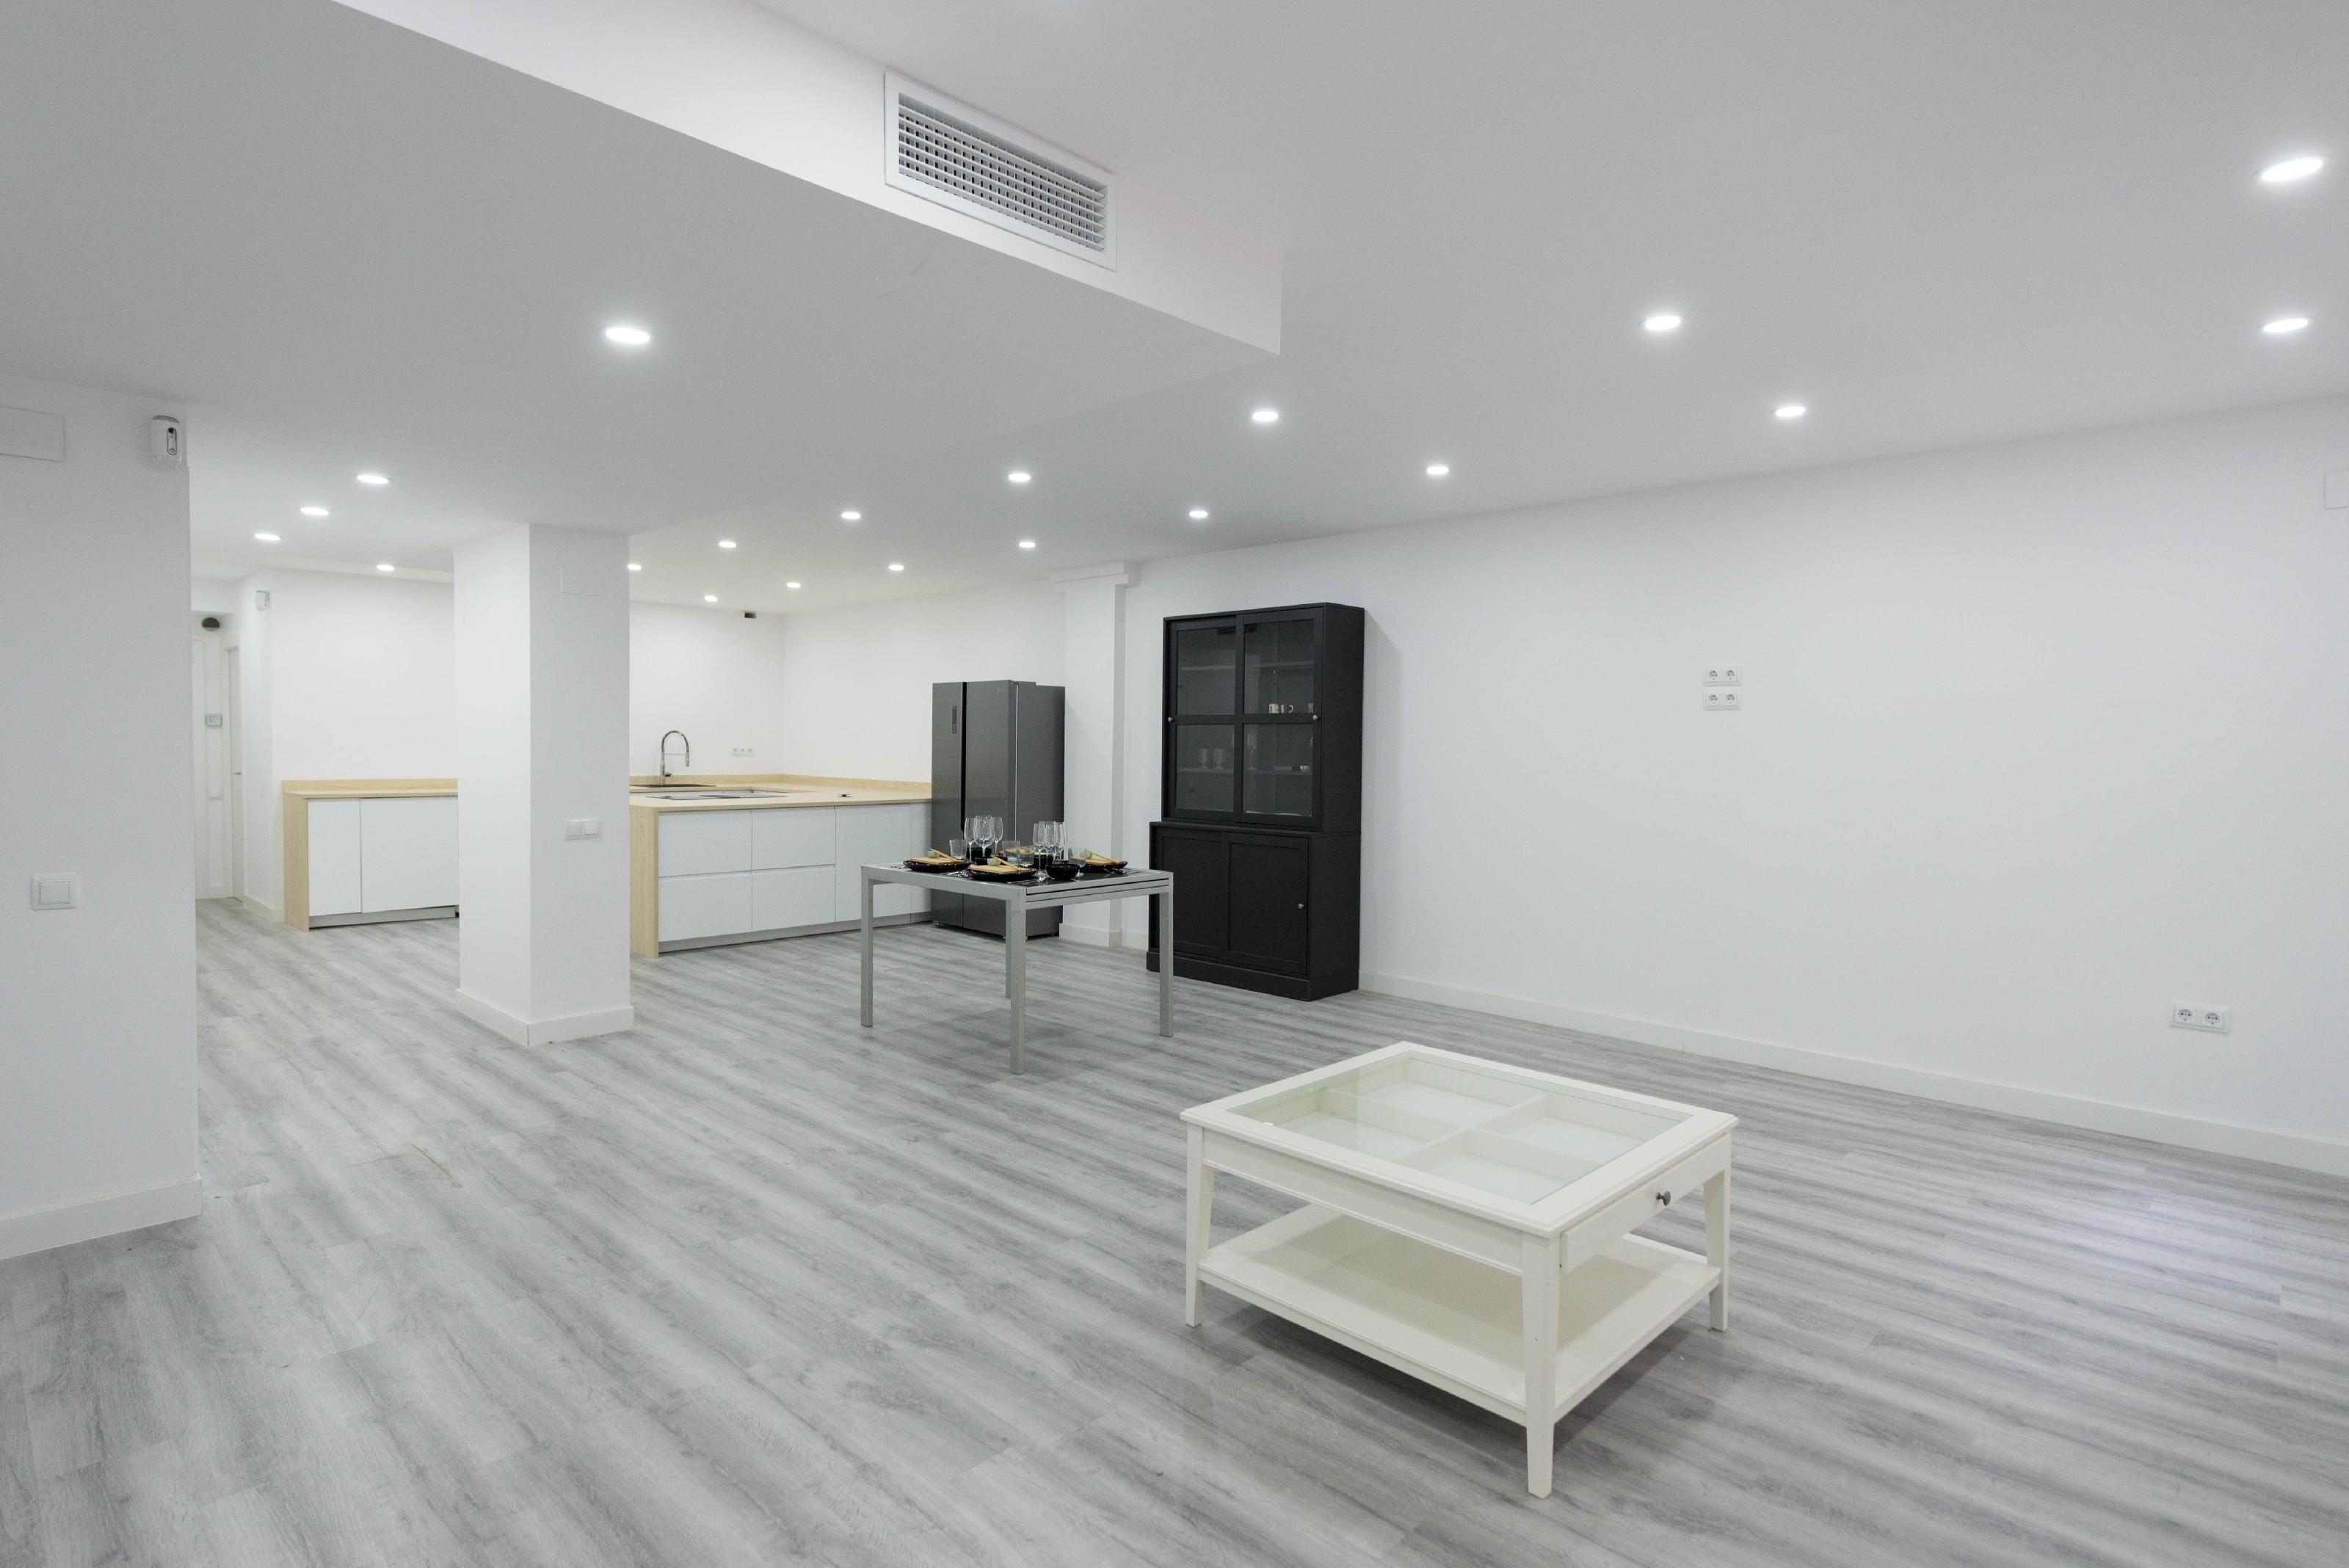 242980 Flat for sale in Eixample, Sagrada Familia 14